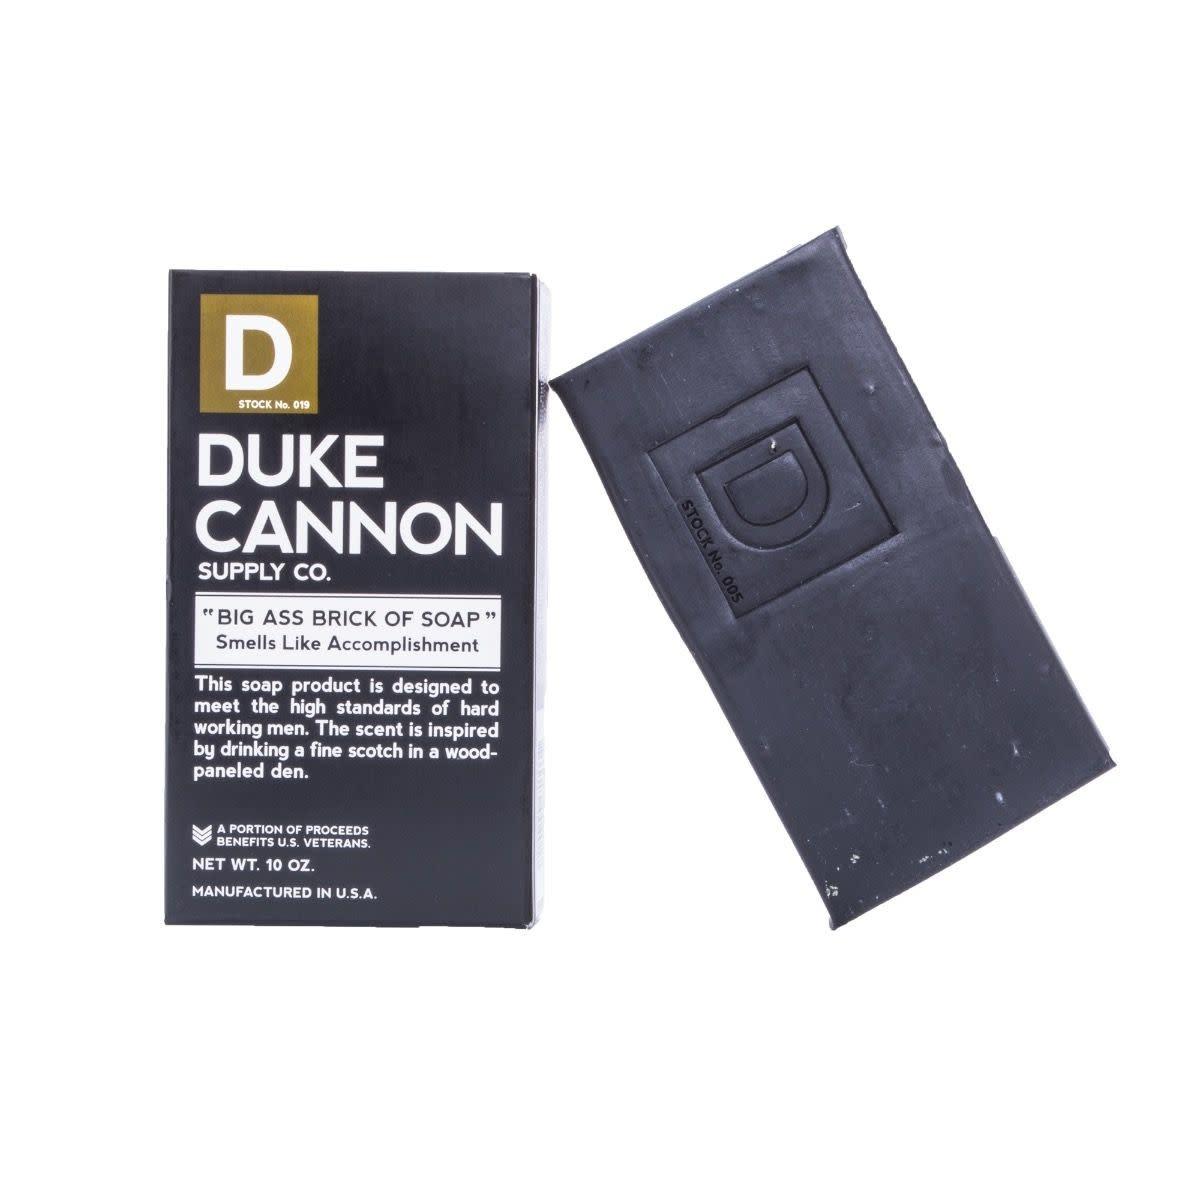 Duke Cannon Limited Edition Accomplishment Big Ass Brick of Soap